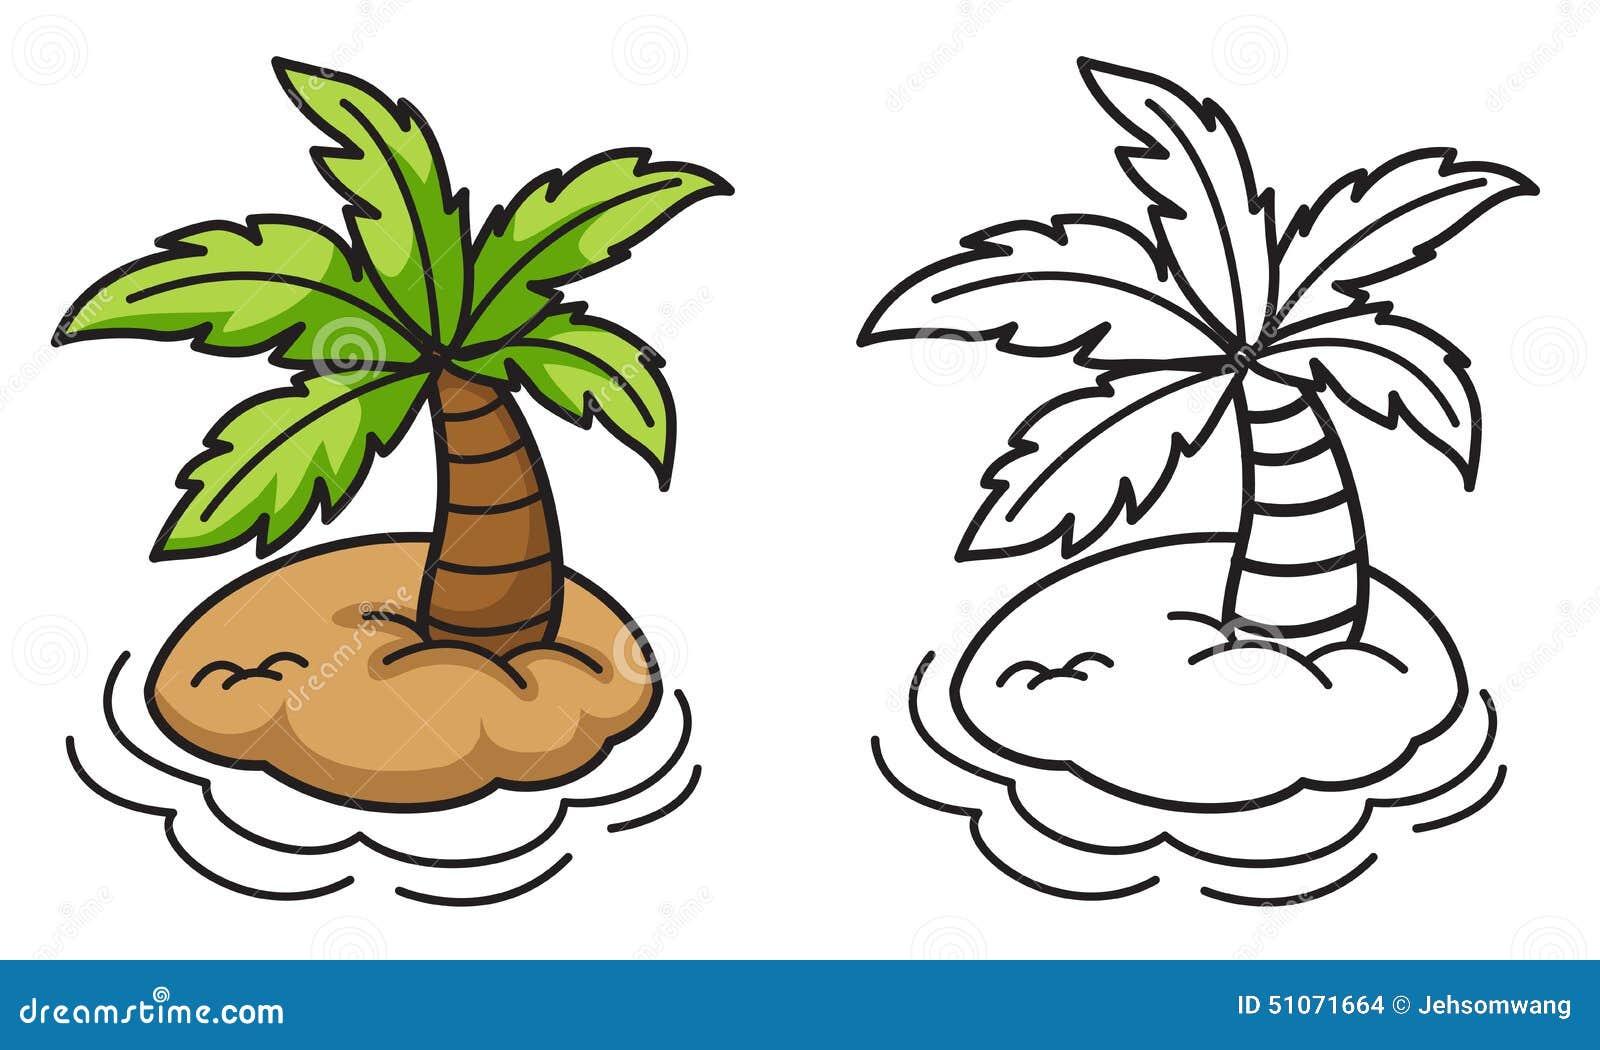 treasure island map kids coloring page stock illustration image